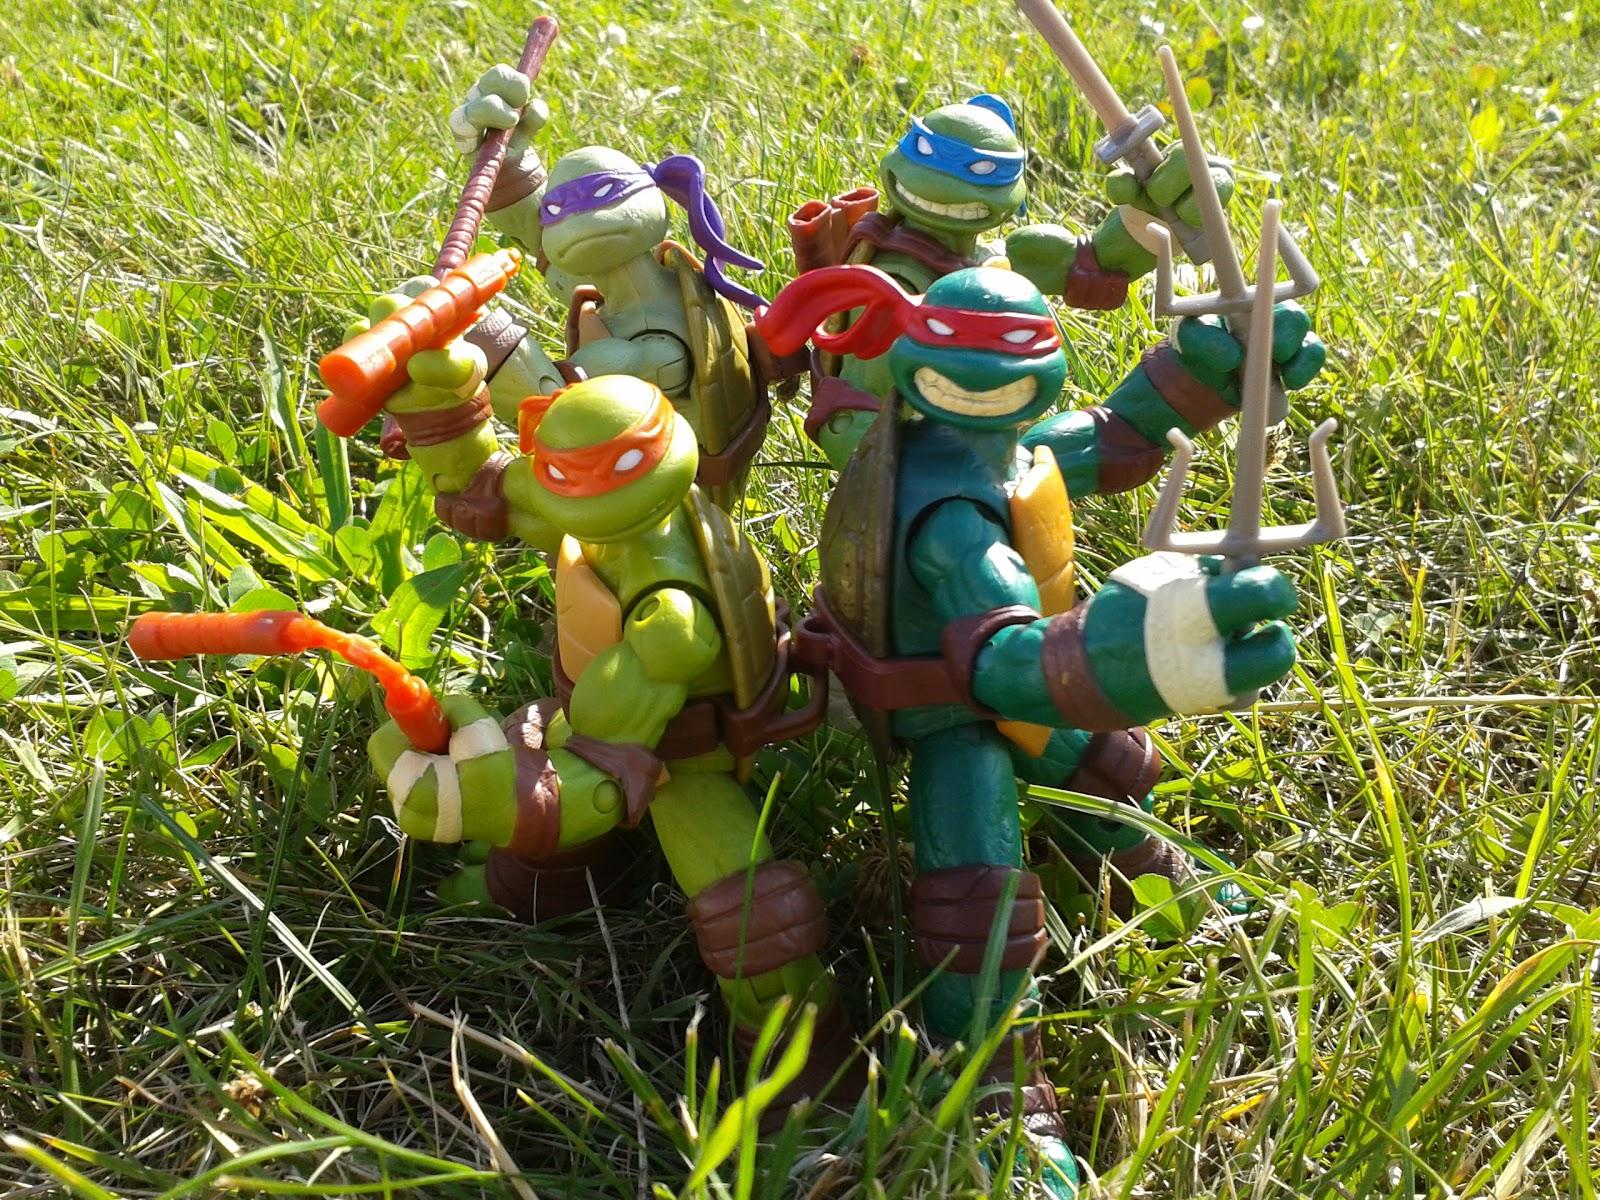 18 Besten Ninja Turtles Bilder Auf Pinterest: Toywalker's Blog: Nickelodeon Teenage Mutant Ninja Turtles